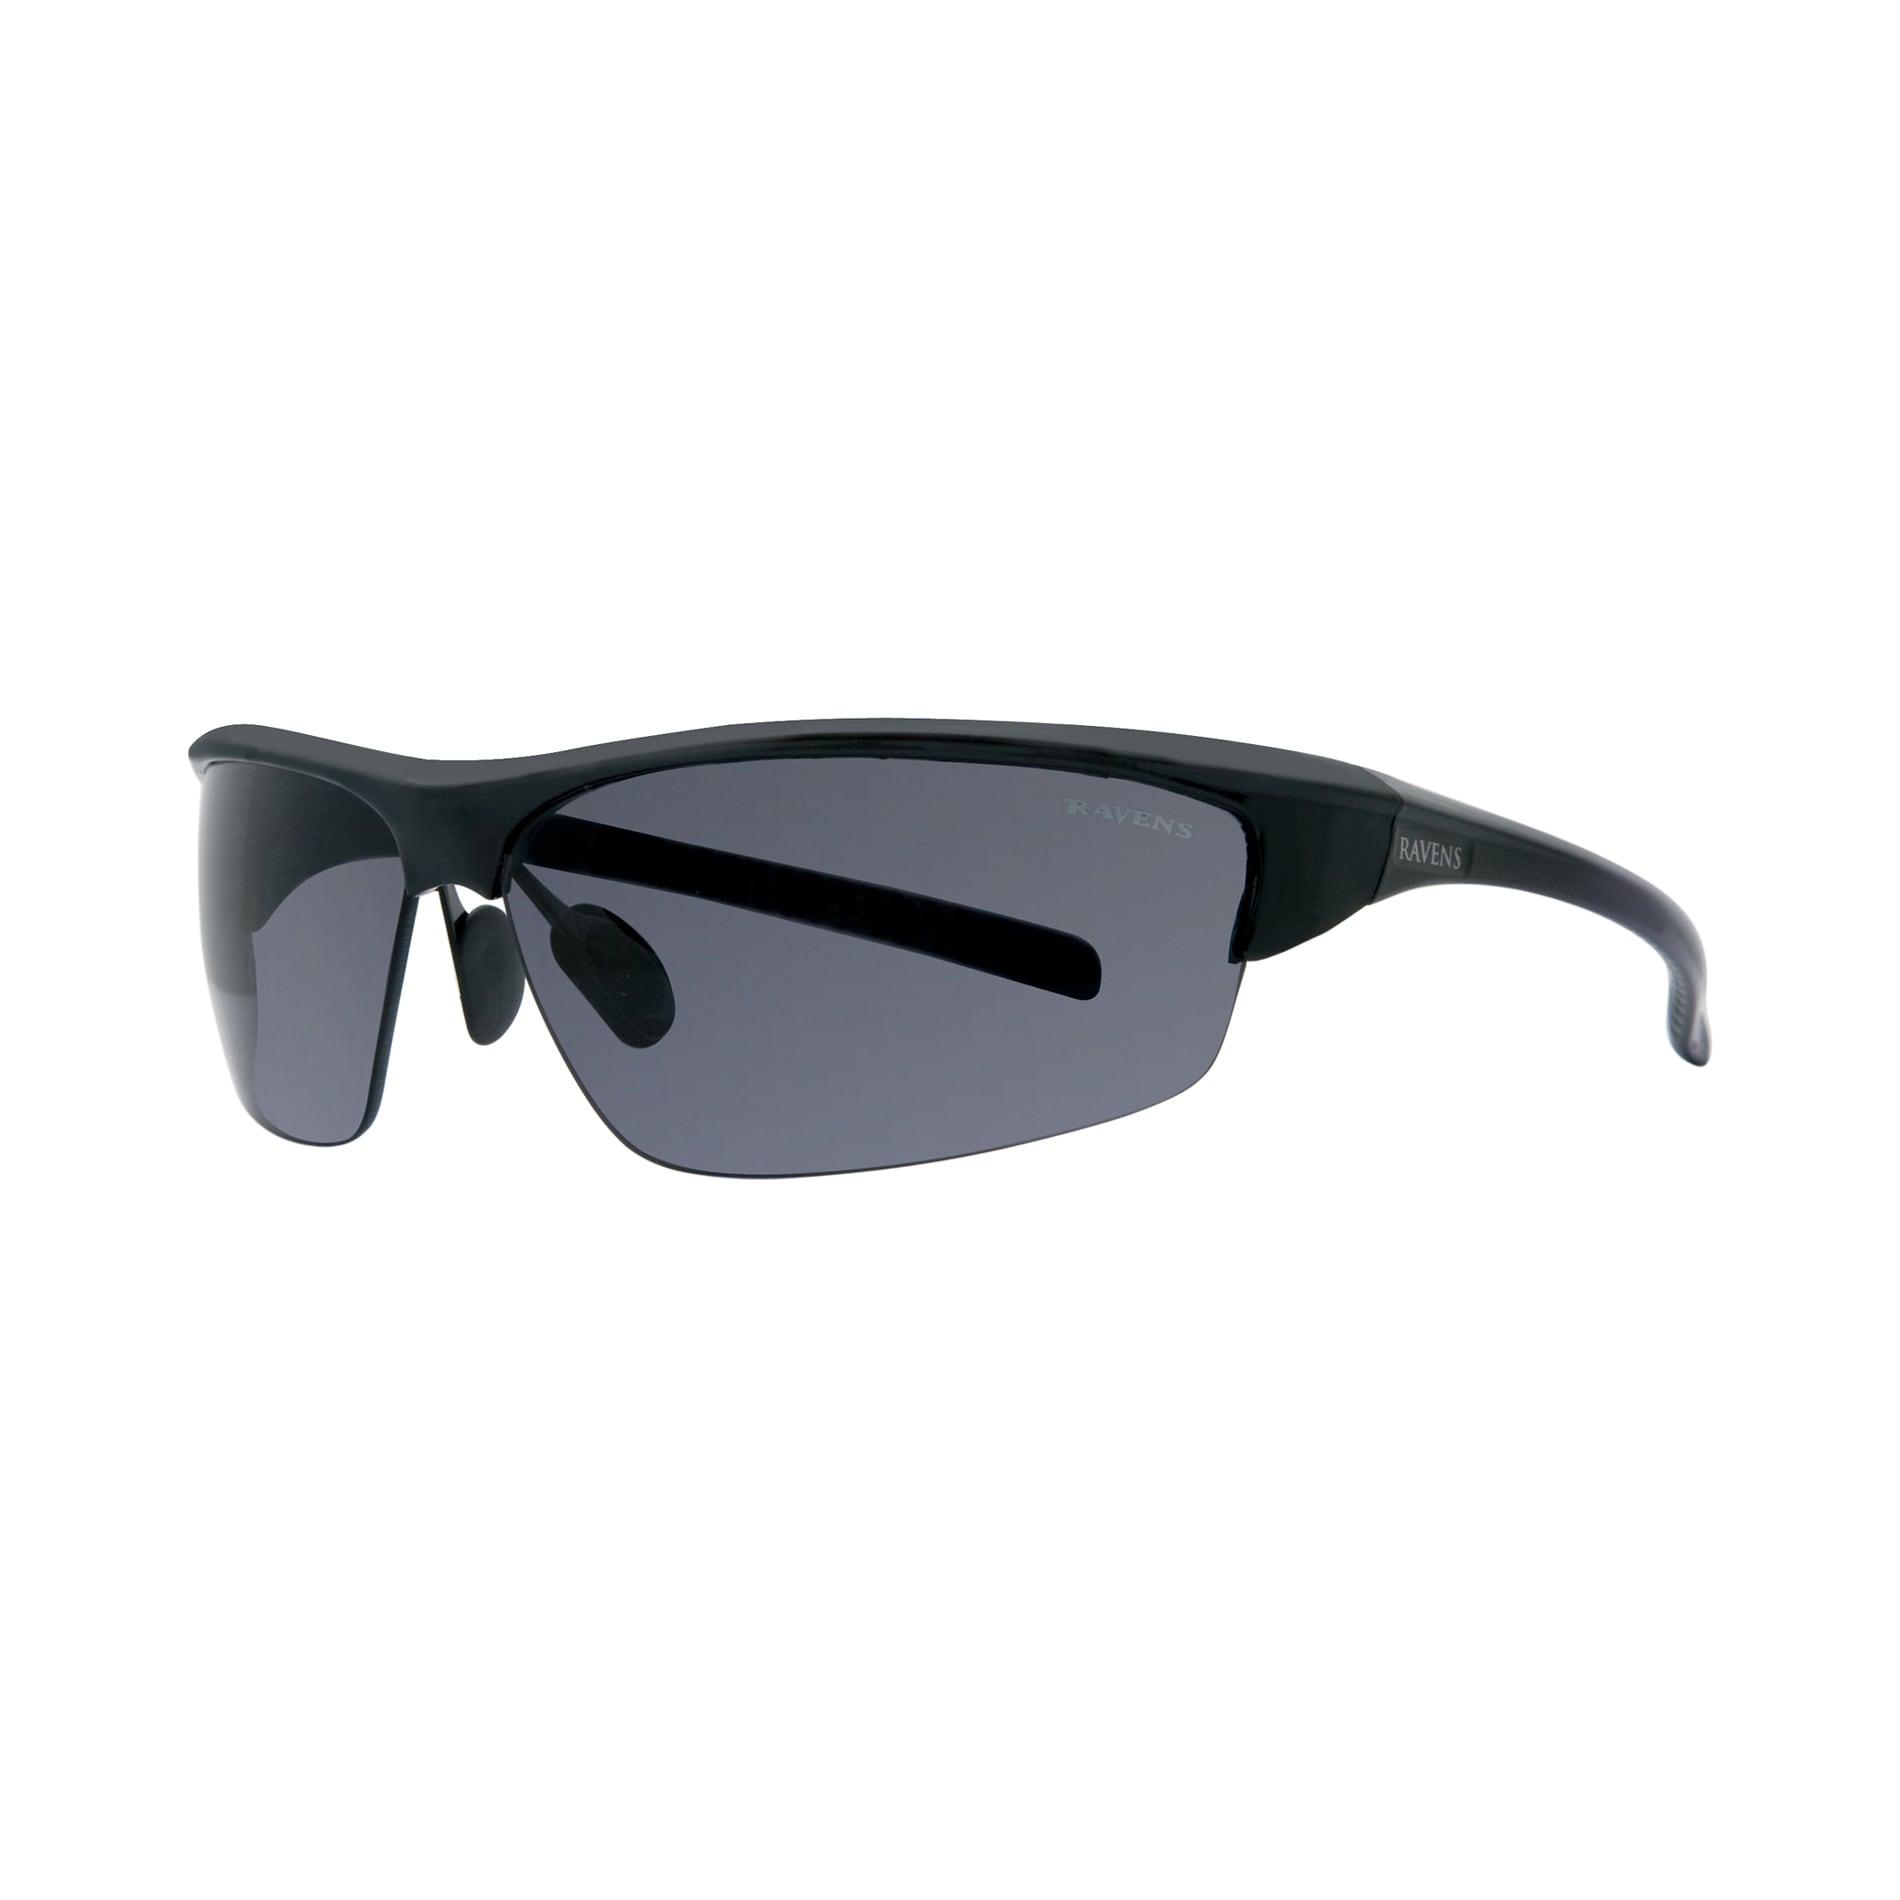 Modo Baltimore Ravens Men's 'Impact' Sunglasses